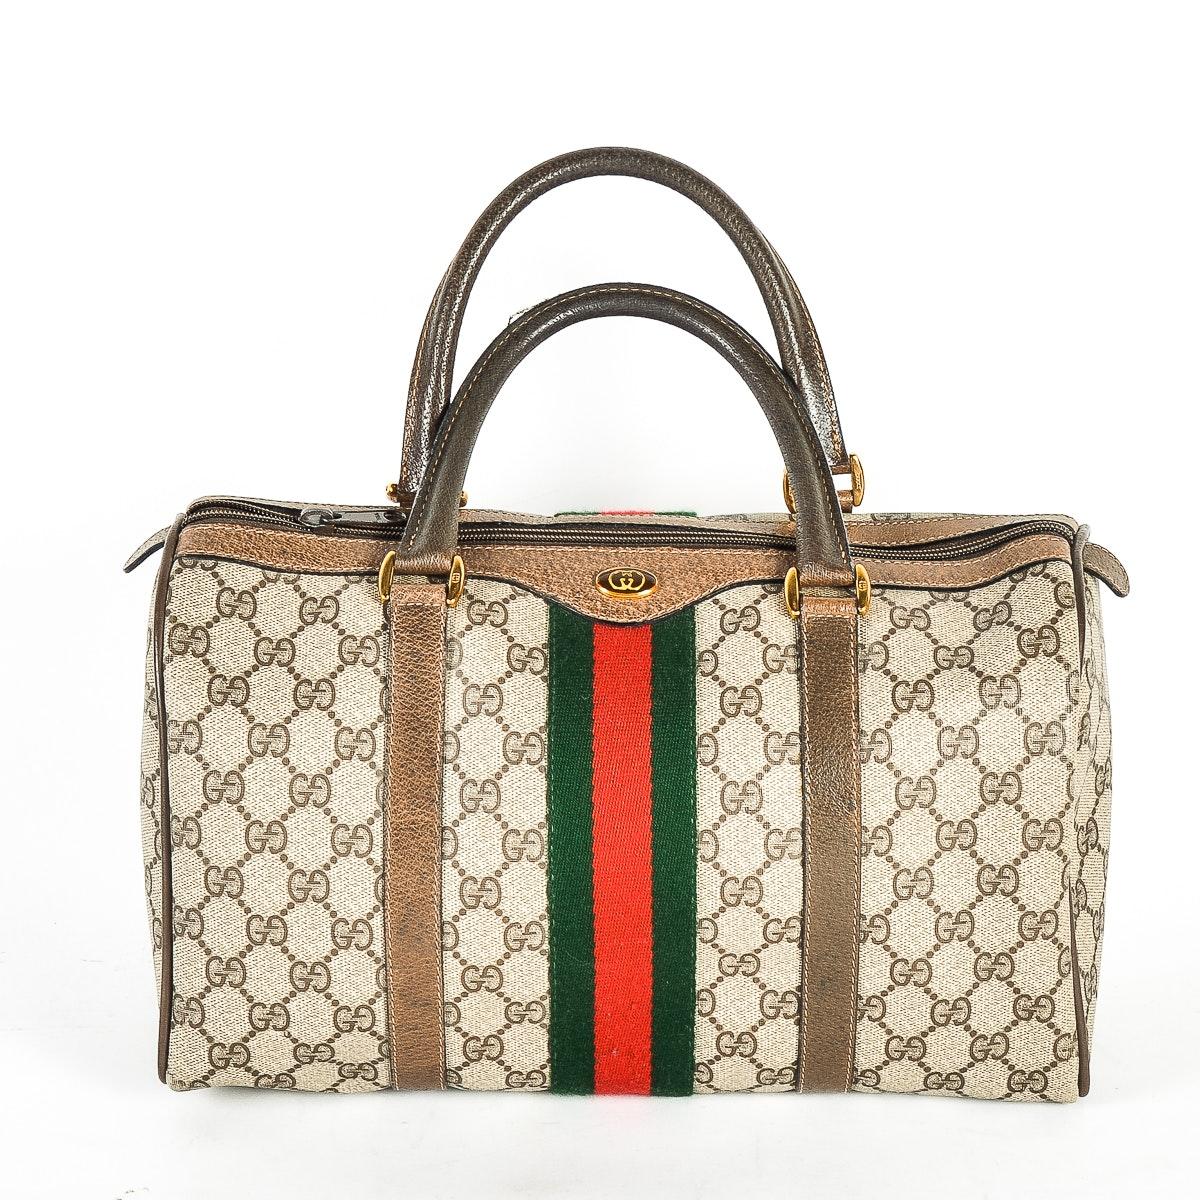 Vintage Gucci Monogrammed Handbag